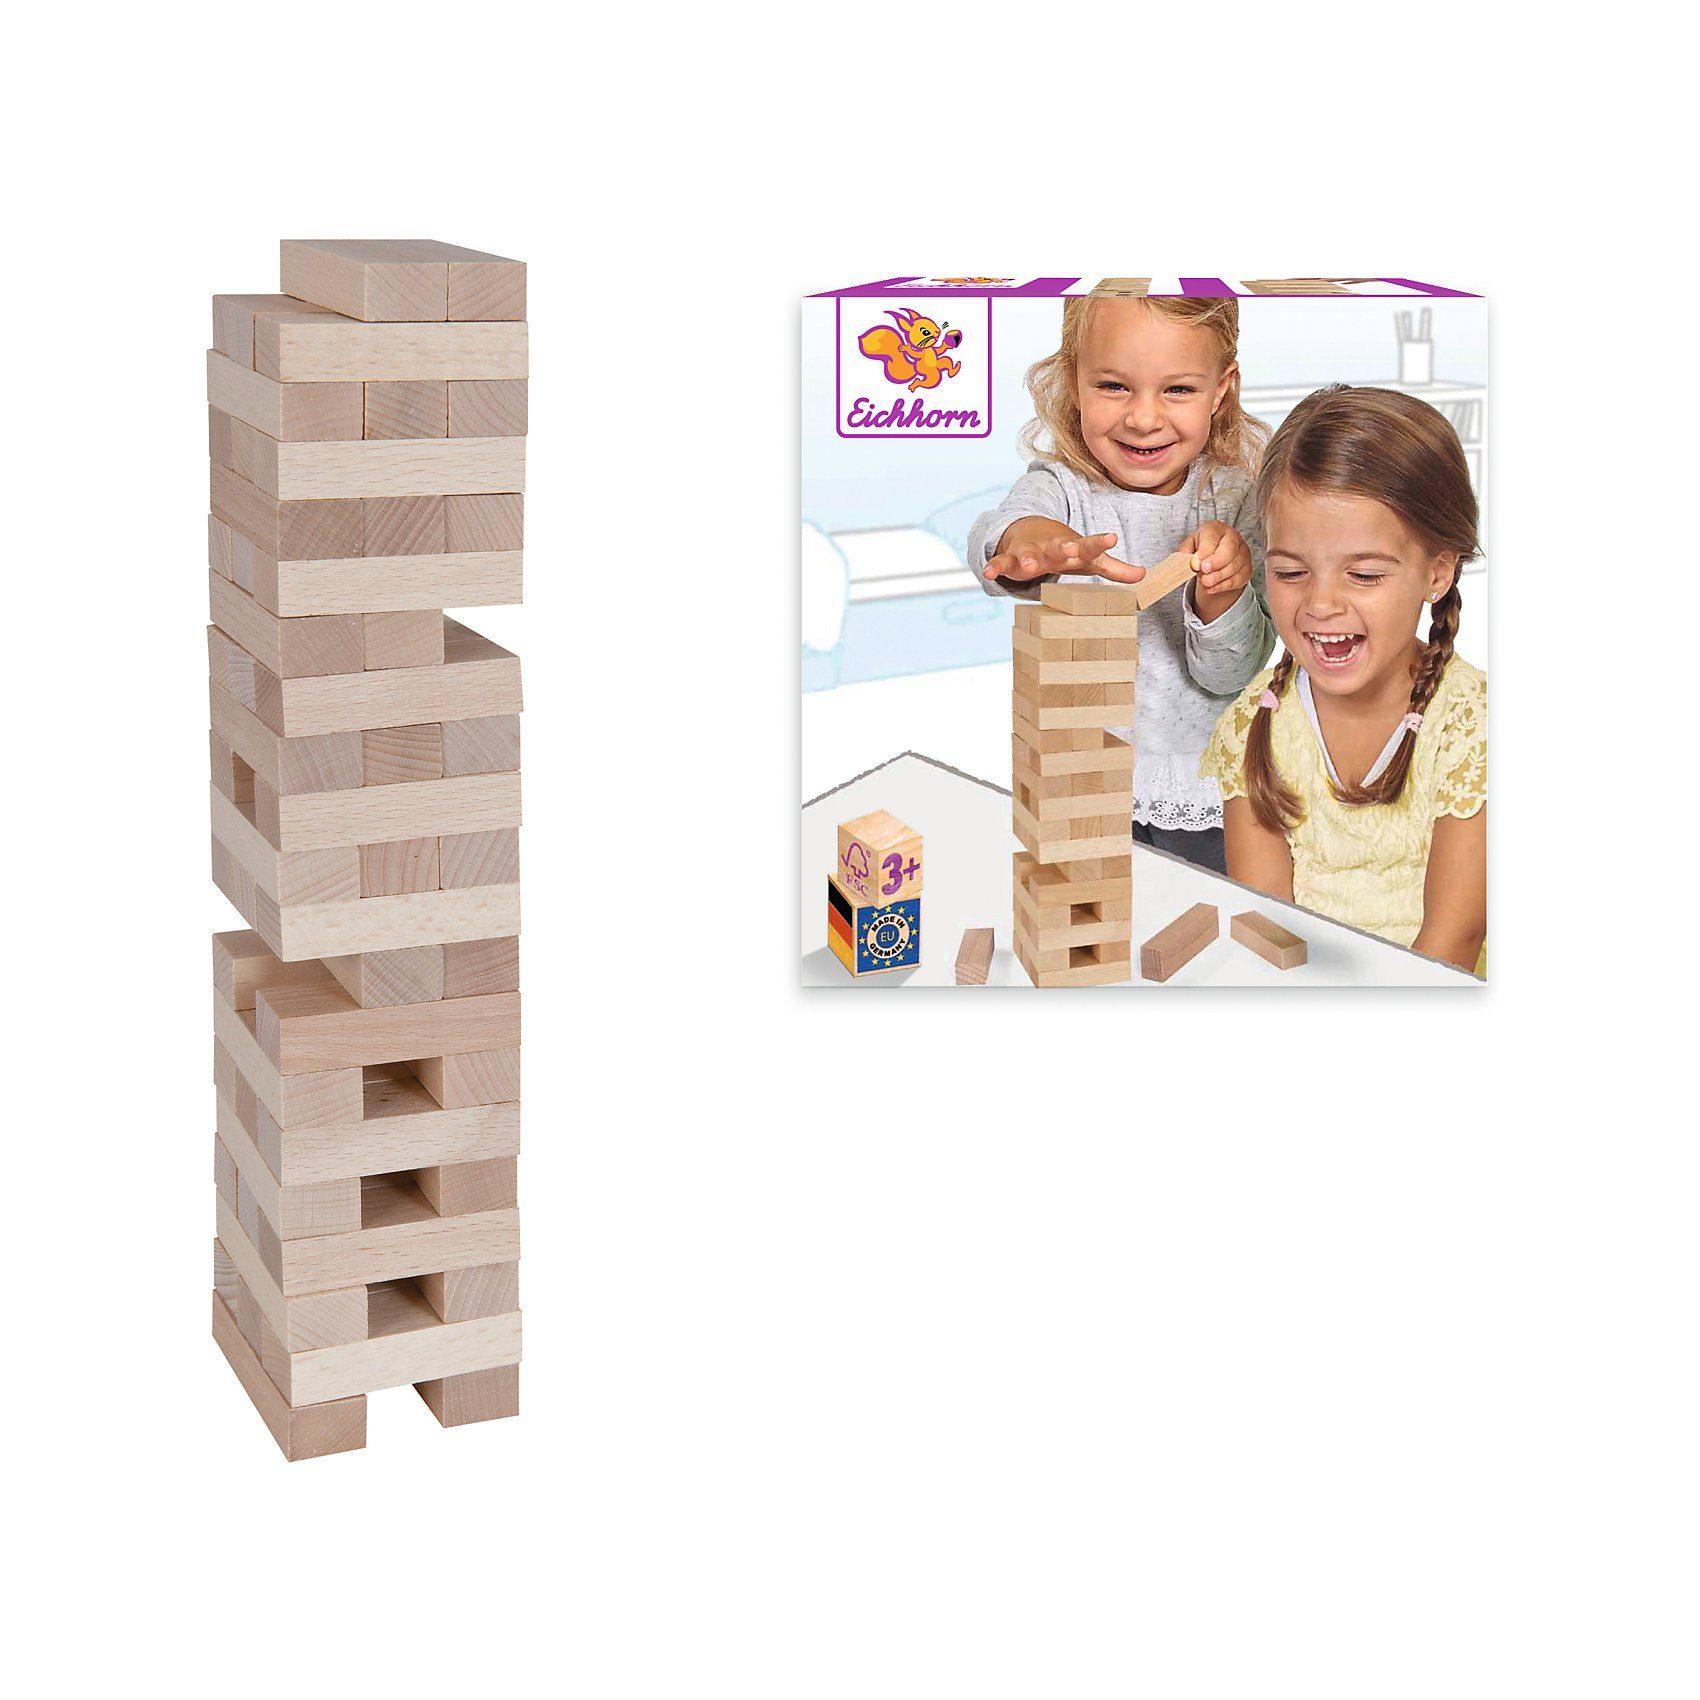 Heros Stapelspiel Holzturm